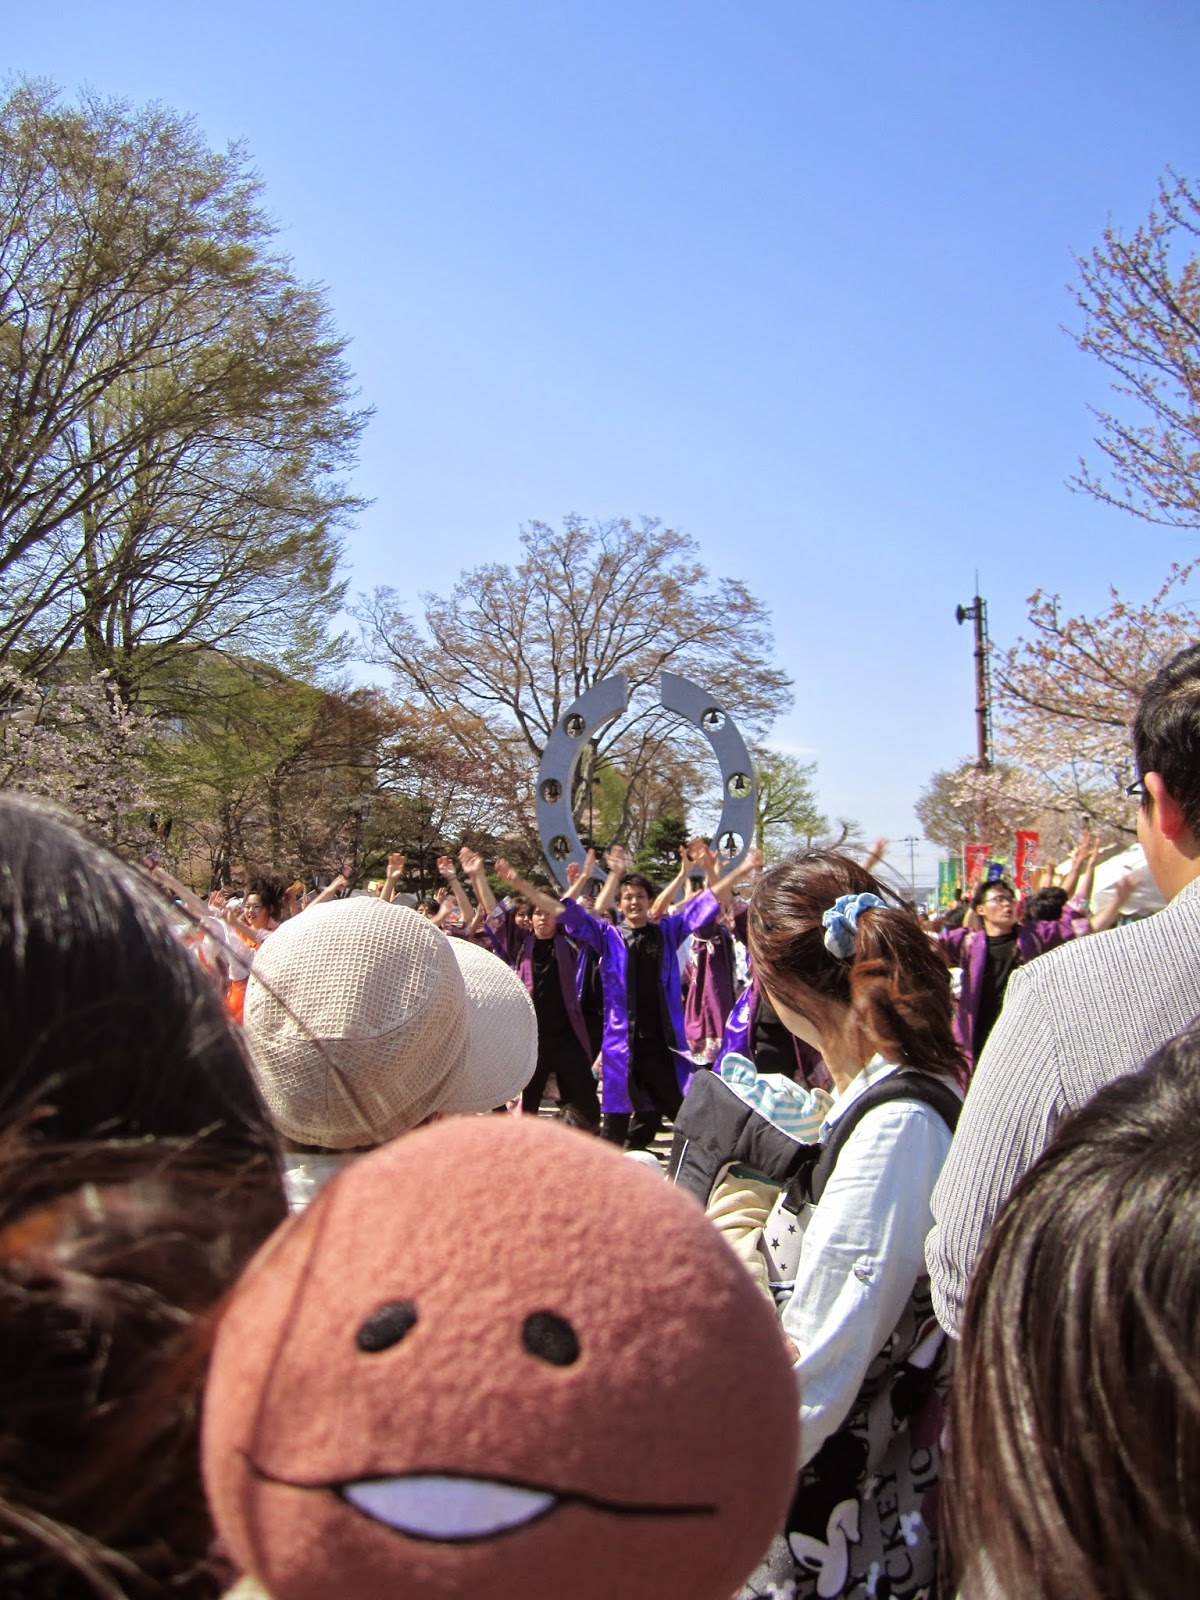 Towada Spring Festival Yosakoi Genki Matsuri 十和田市春まつり2015 よさこい元気まつり